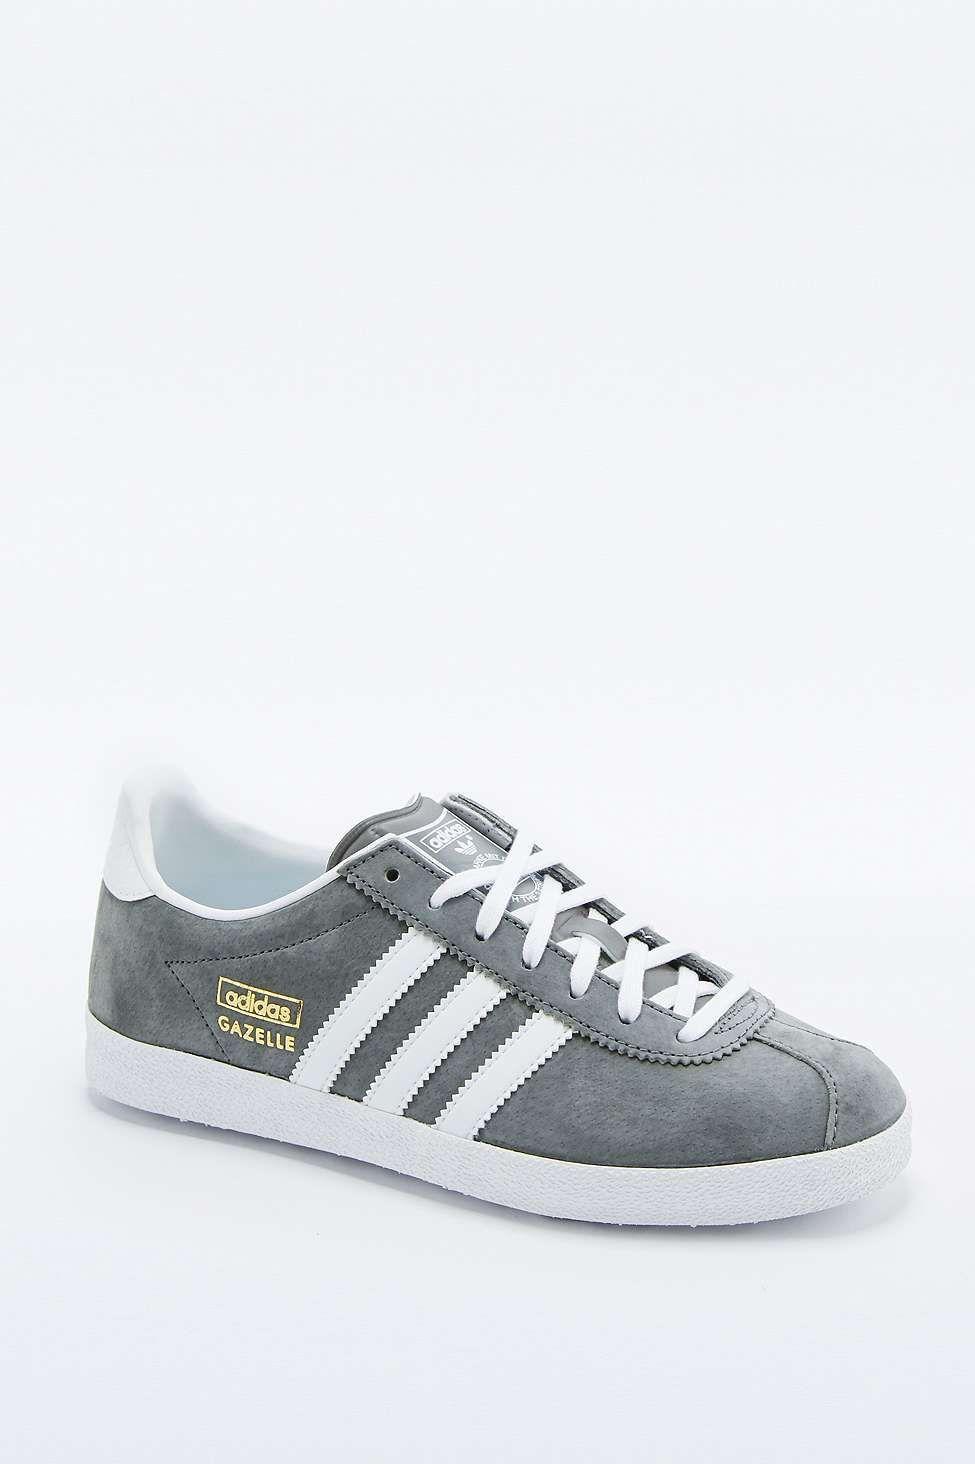 sports shoes dbcbd f55d5 adidas Originals Gazelle Grey Trainers. adidas Originals Gazelle Grey  Trainers Gazelle Gris ...